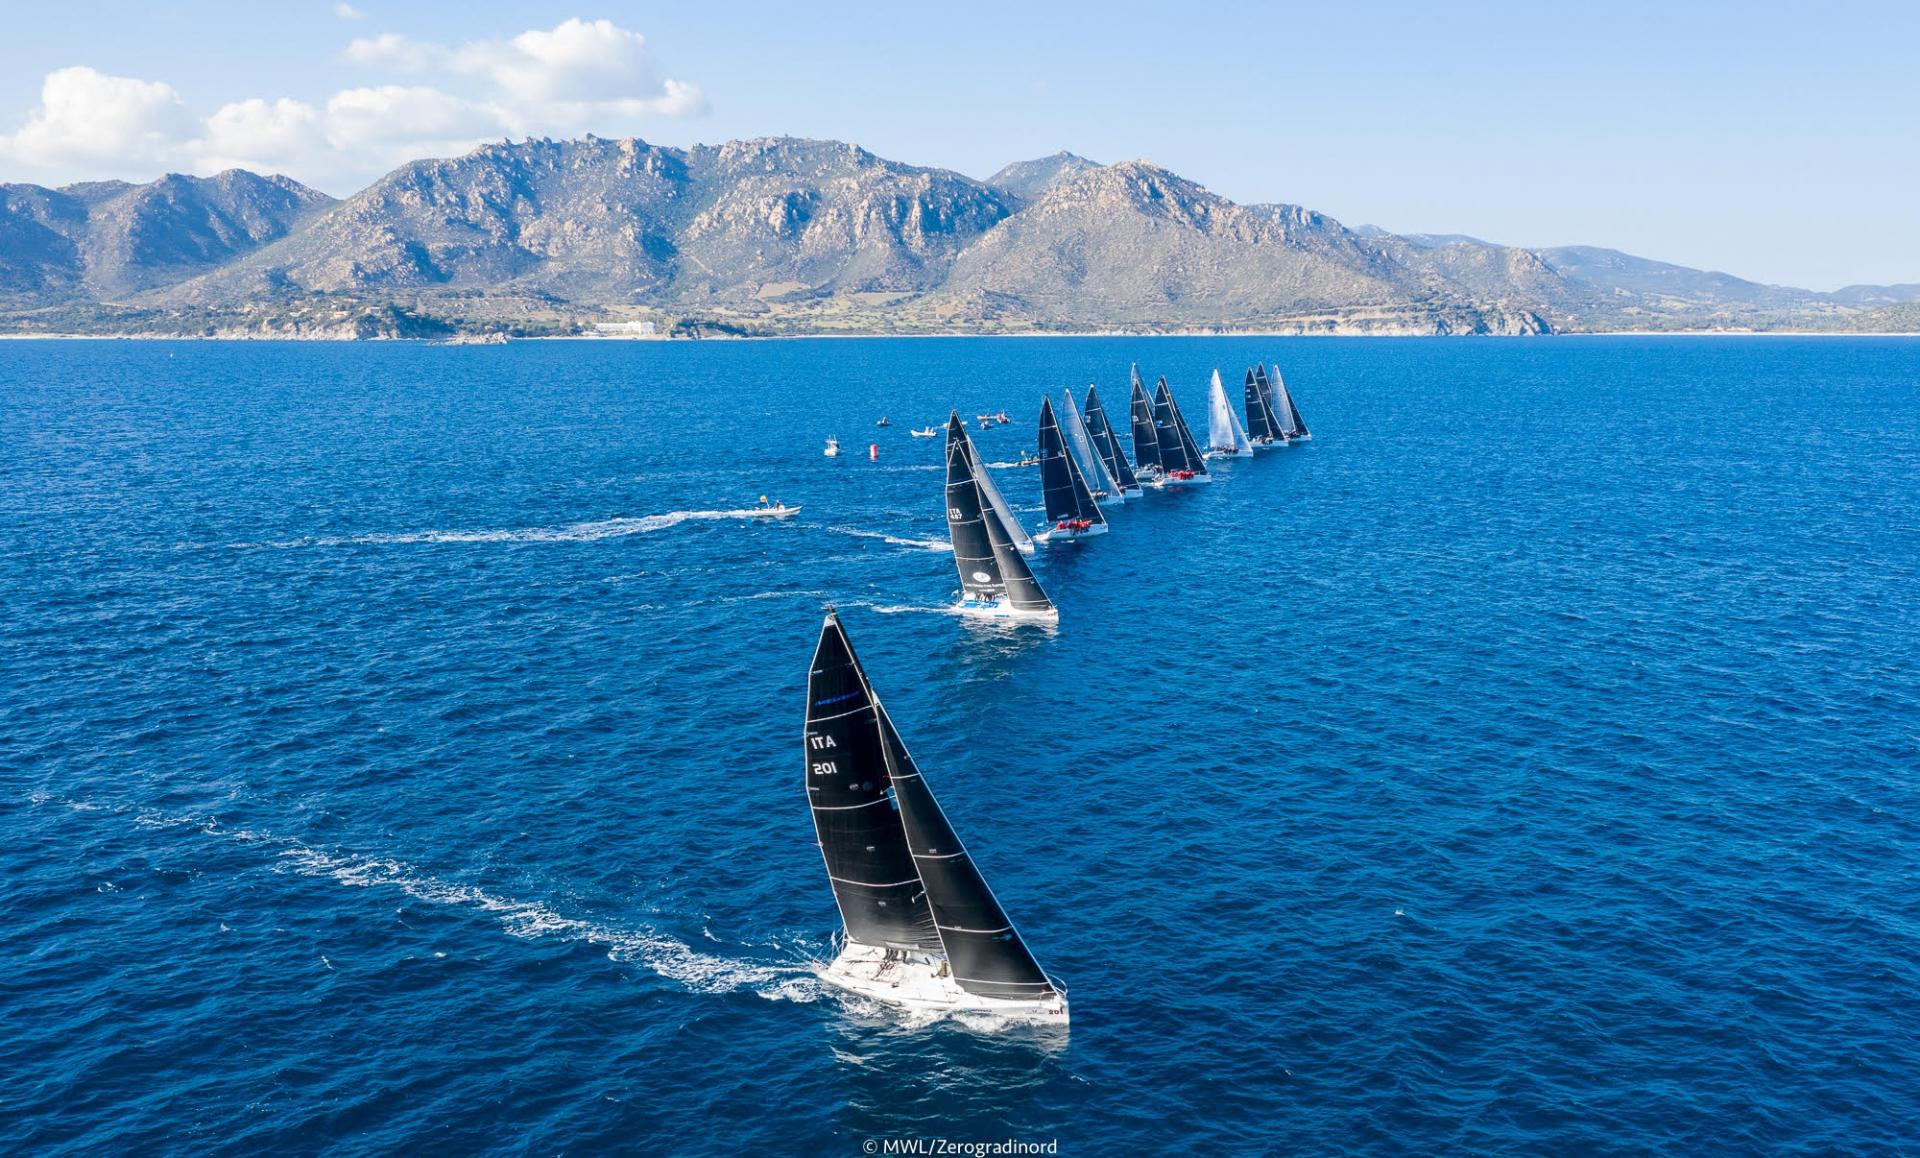 Conclusa la Melges 20 World League European Division - NEWS - Yacht Club Costa Smeralda